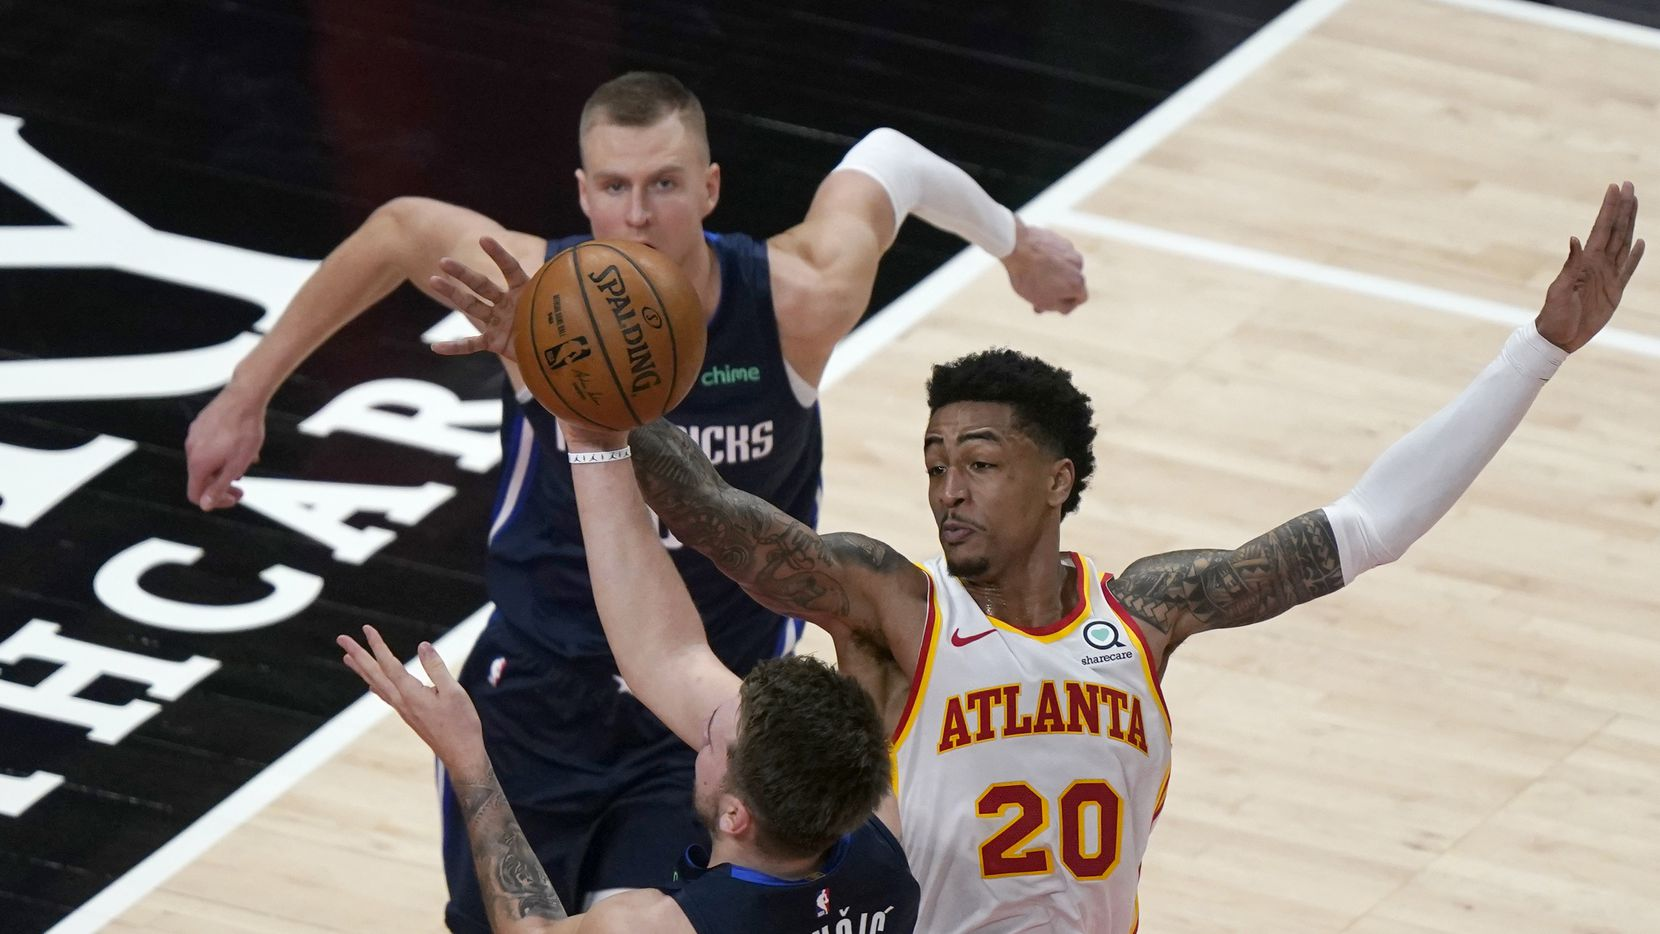 Dallas Mavericks guard Luka Doncic (77) is defended by Atlanta Hawks forward John Collins (20) during the second half of an NBA basketball game Wednesday, Feb. 3, 2021, in Atlanta. Mavericks forward Kristaps Porzingis is at rear. (AP Photo/John Bazemore)